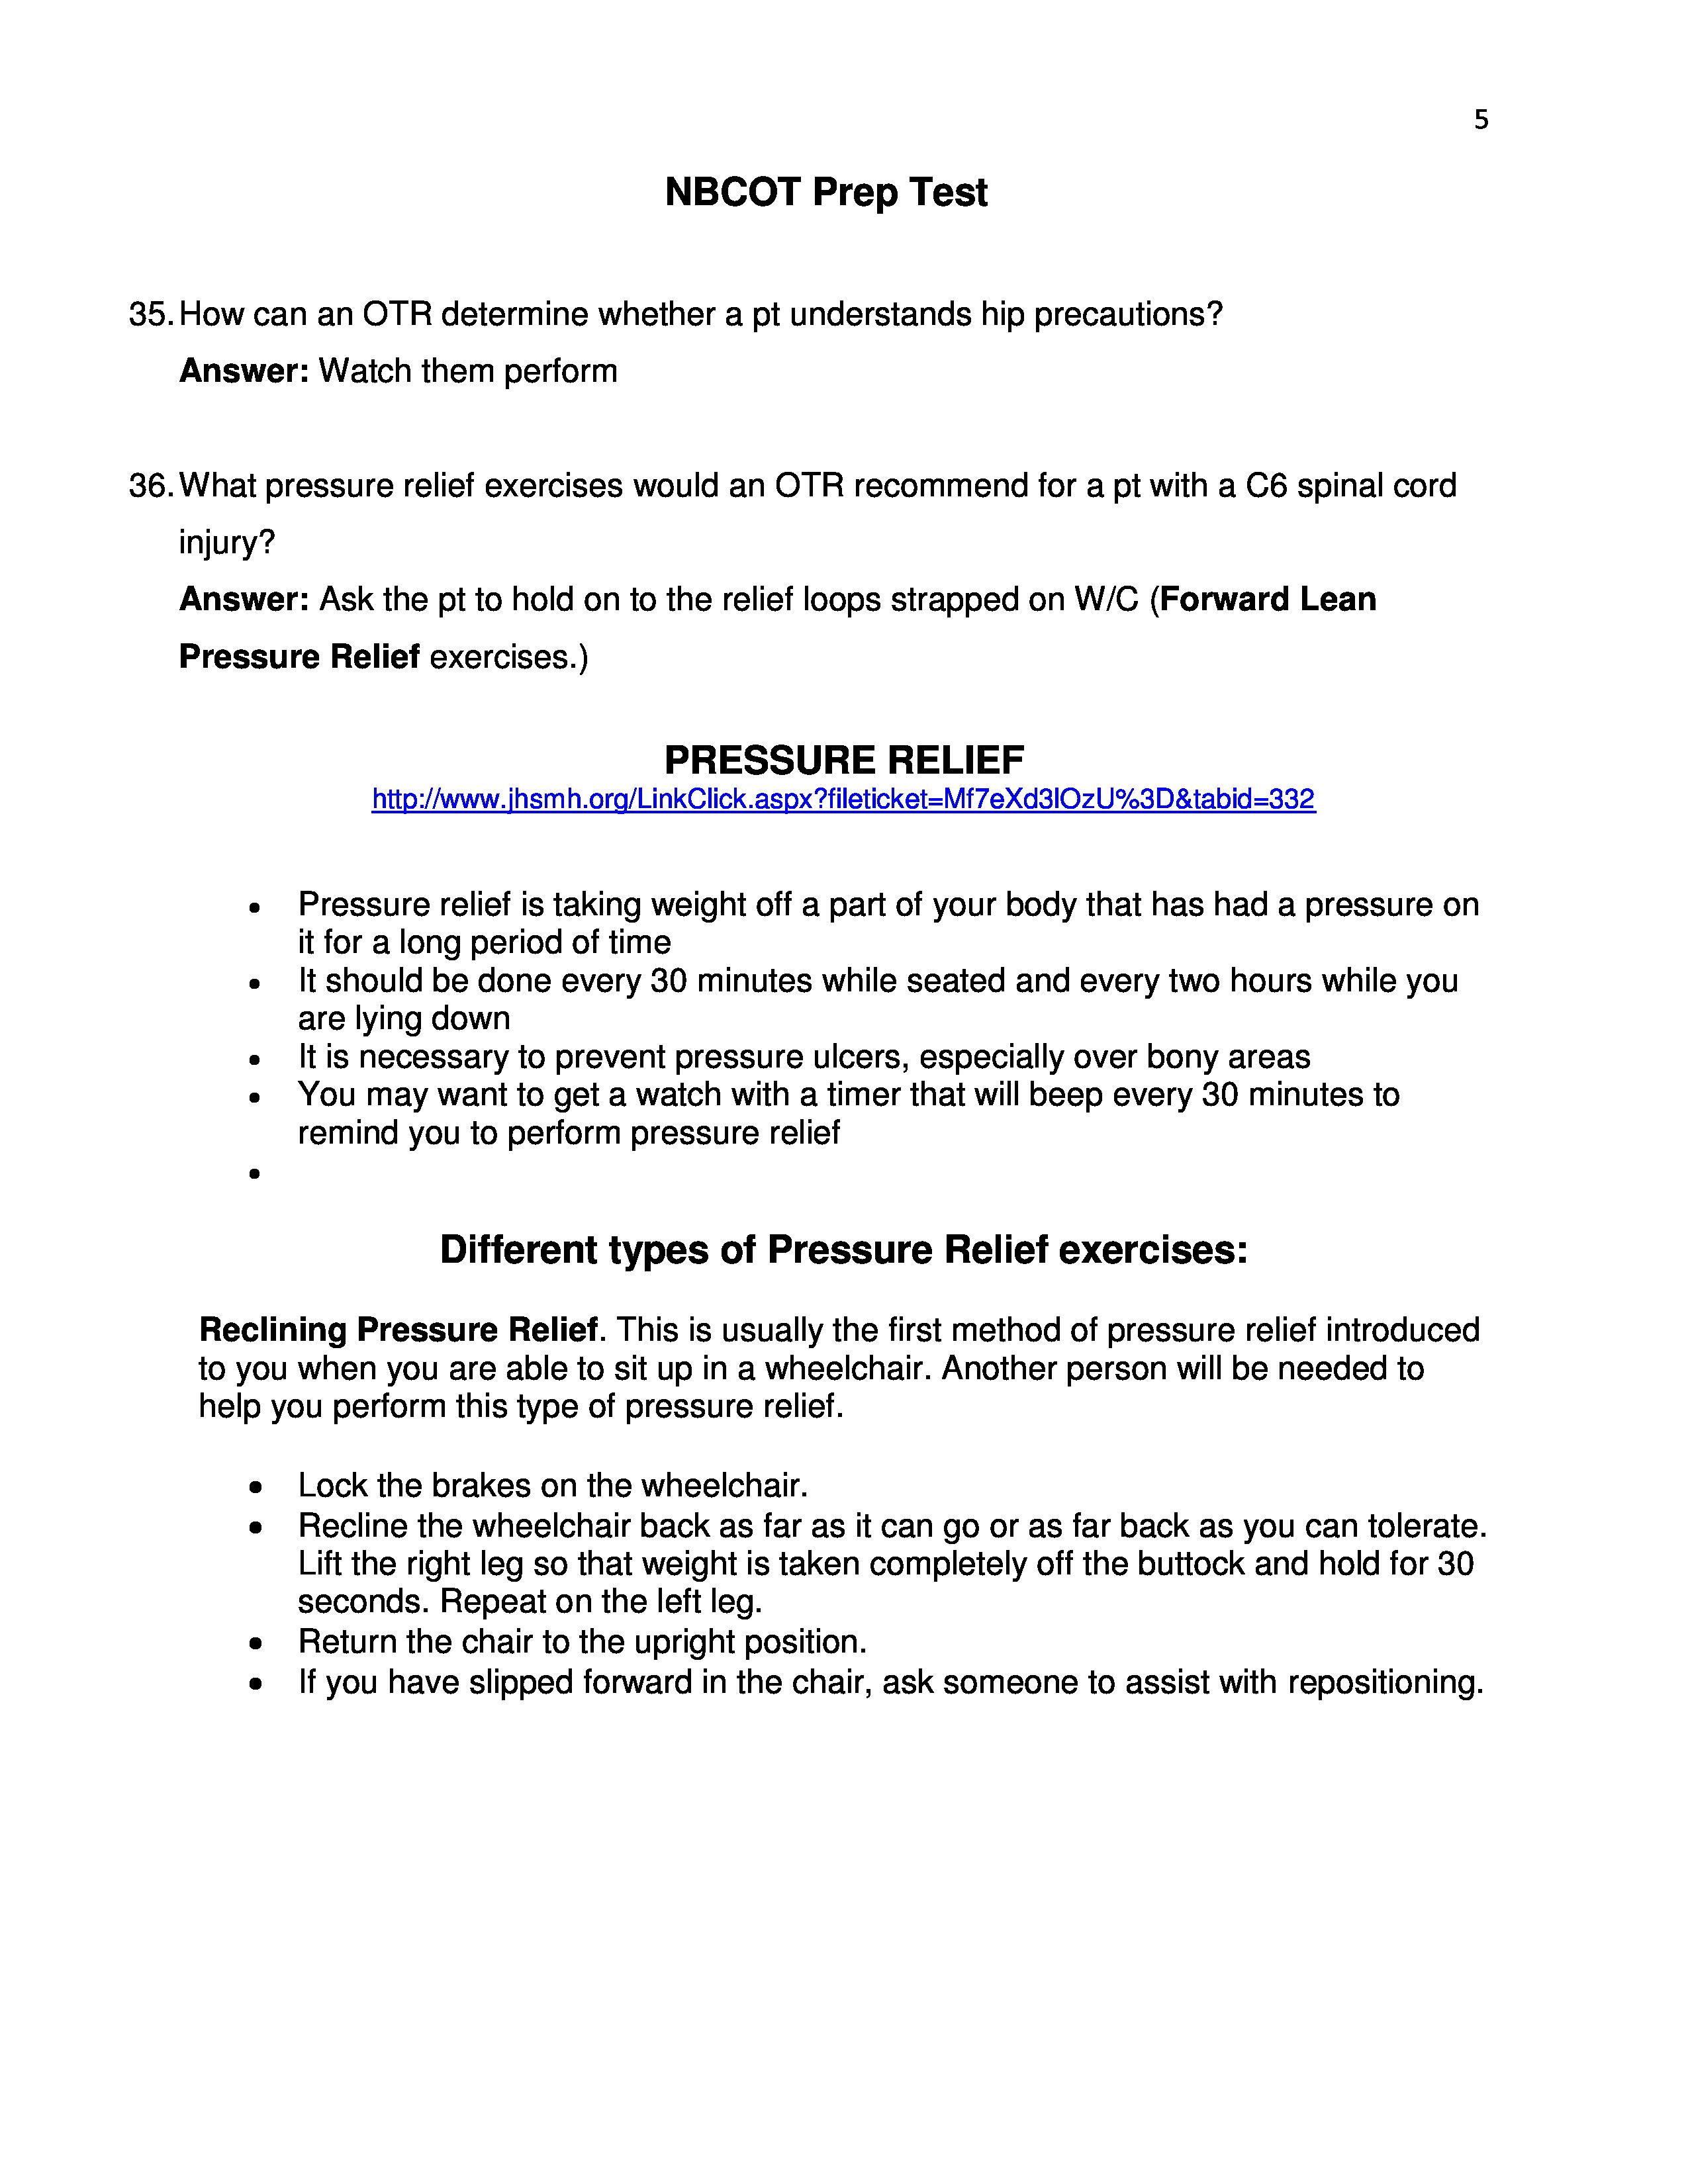 Nbcot Prep Test 4 Nbcote Study Guide Pinterest Occupational